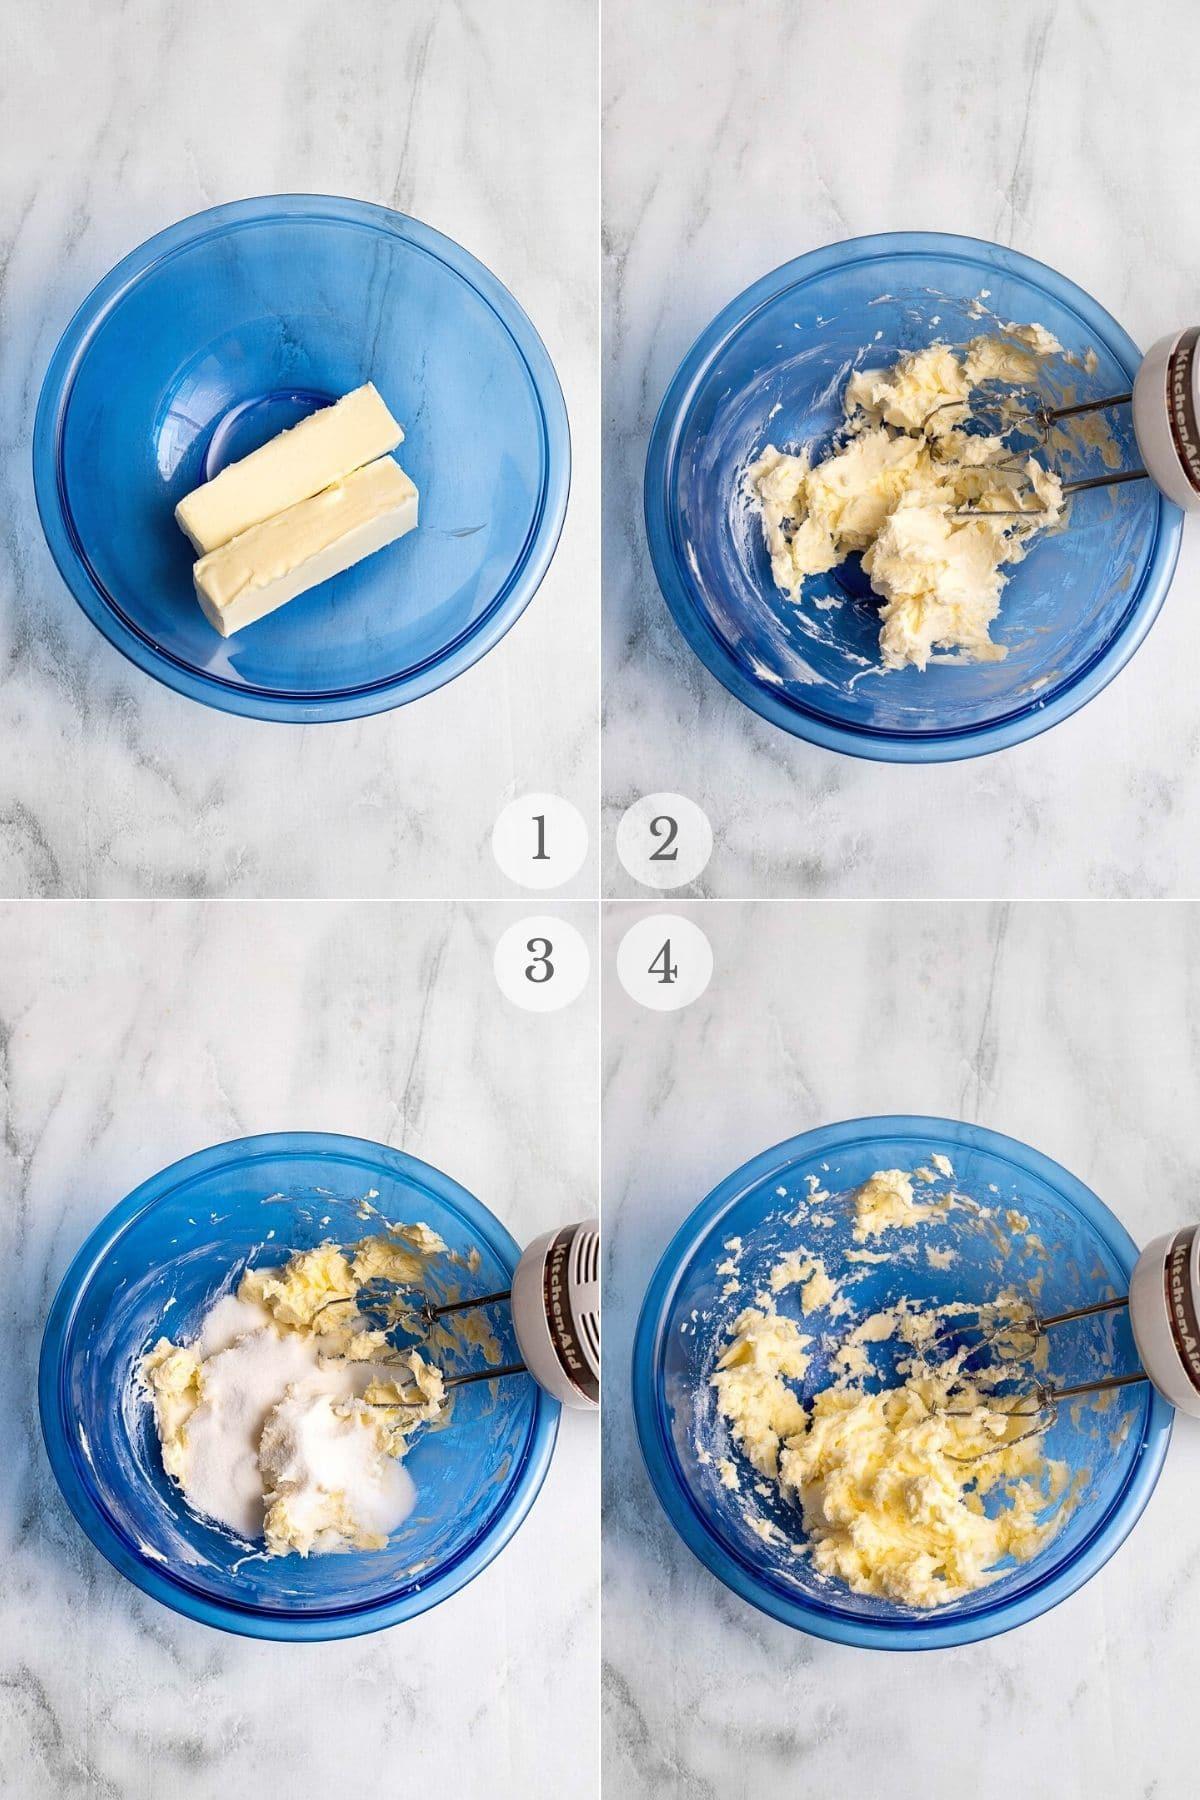 butter cookies recipe steps 1-4